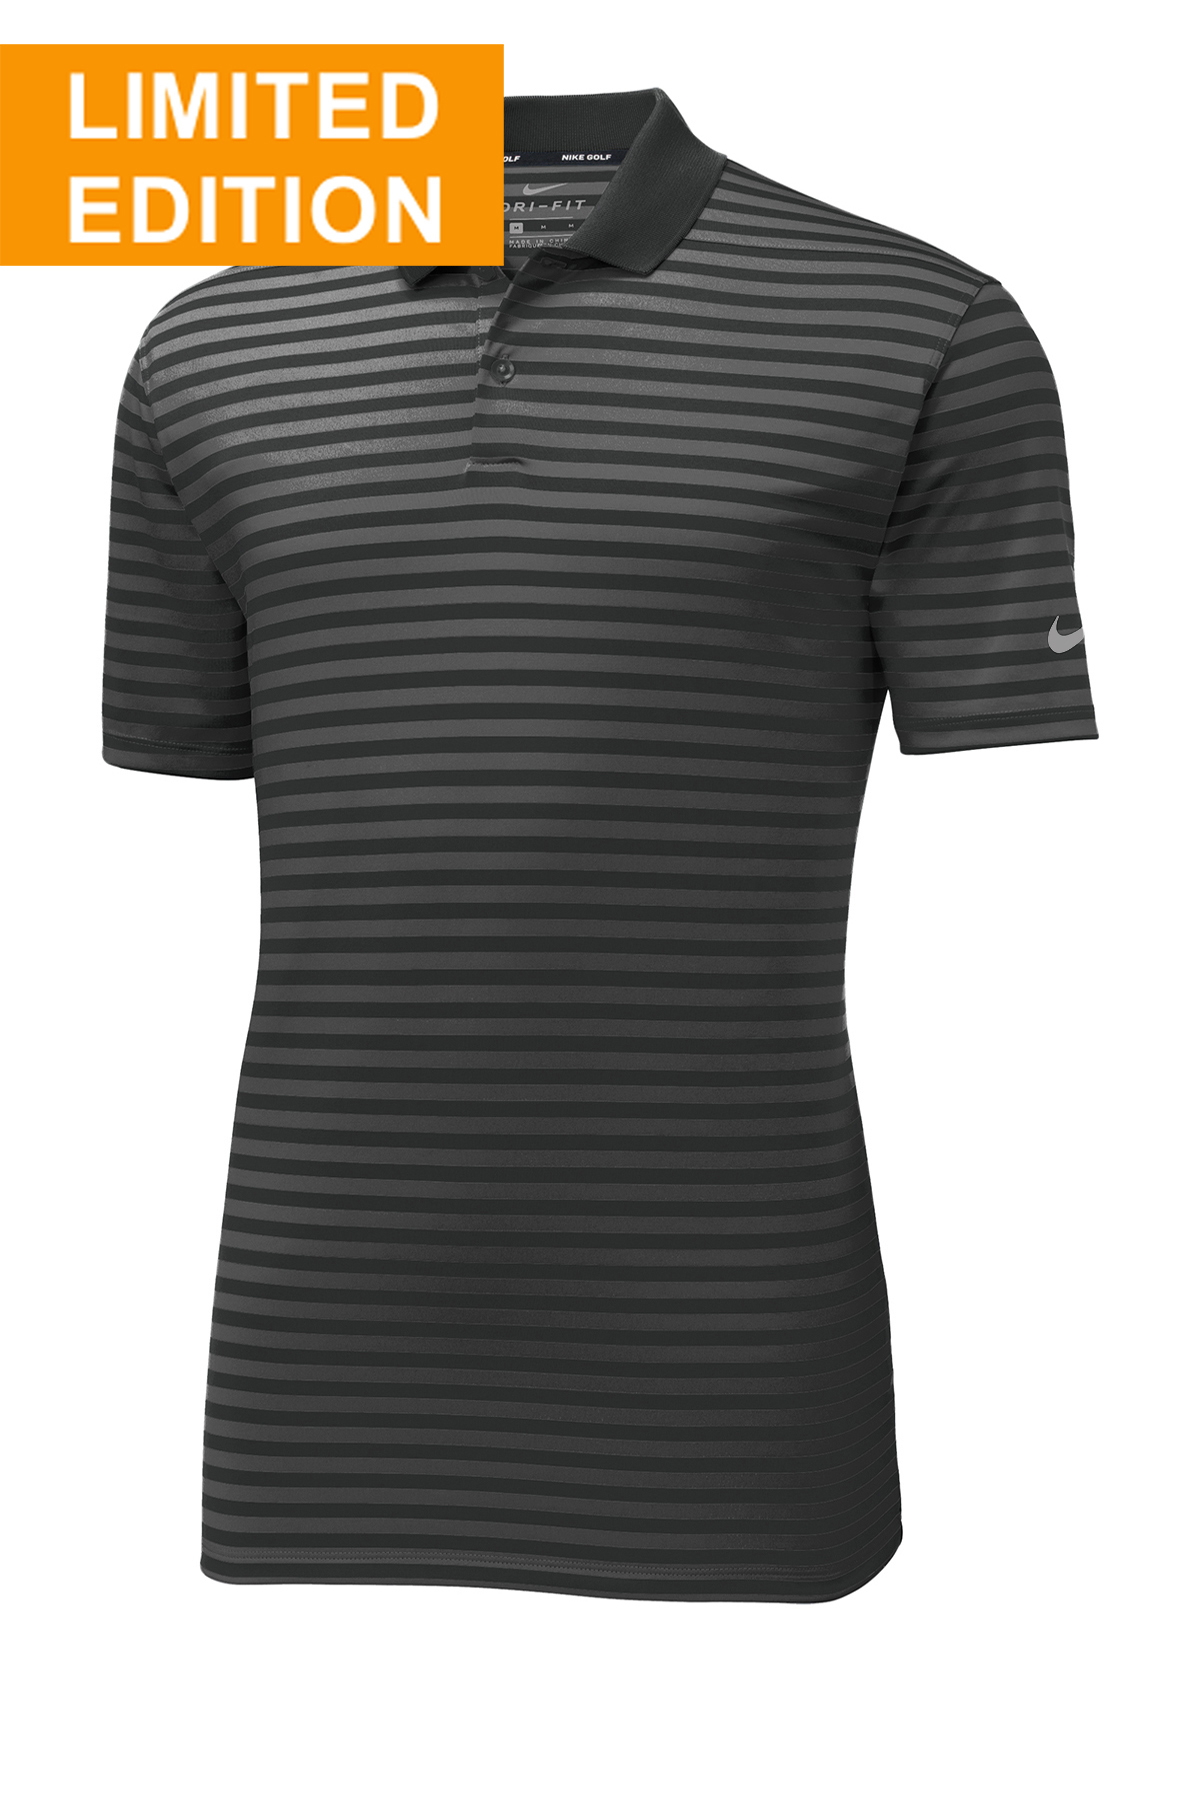 Nike Victory Striped Polo Nike Brands Sanmar